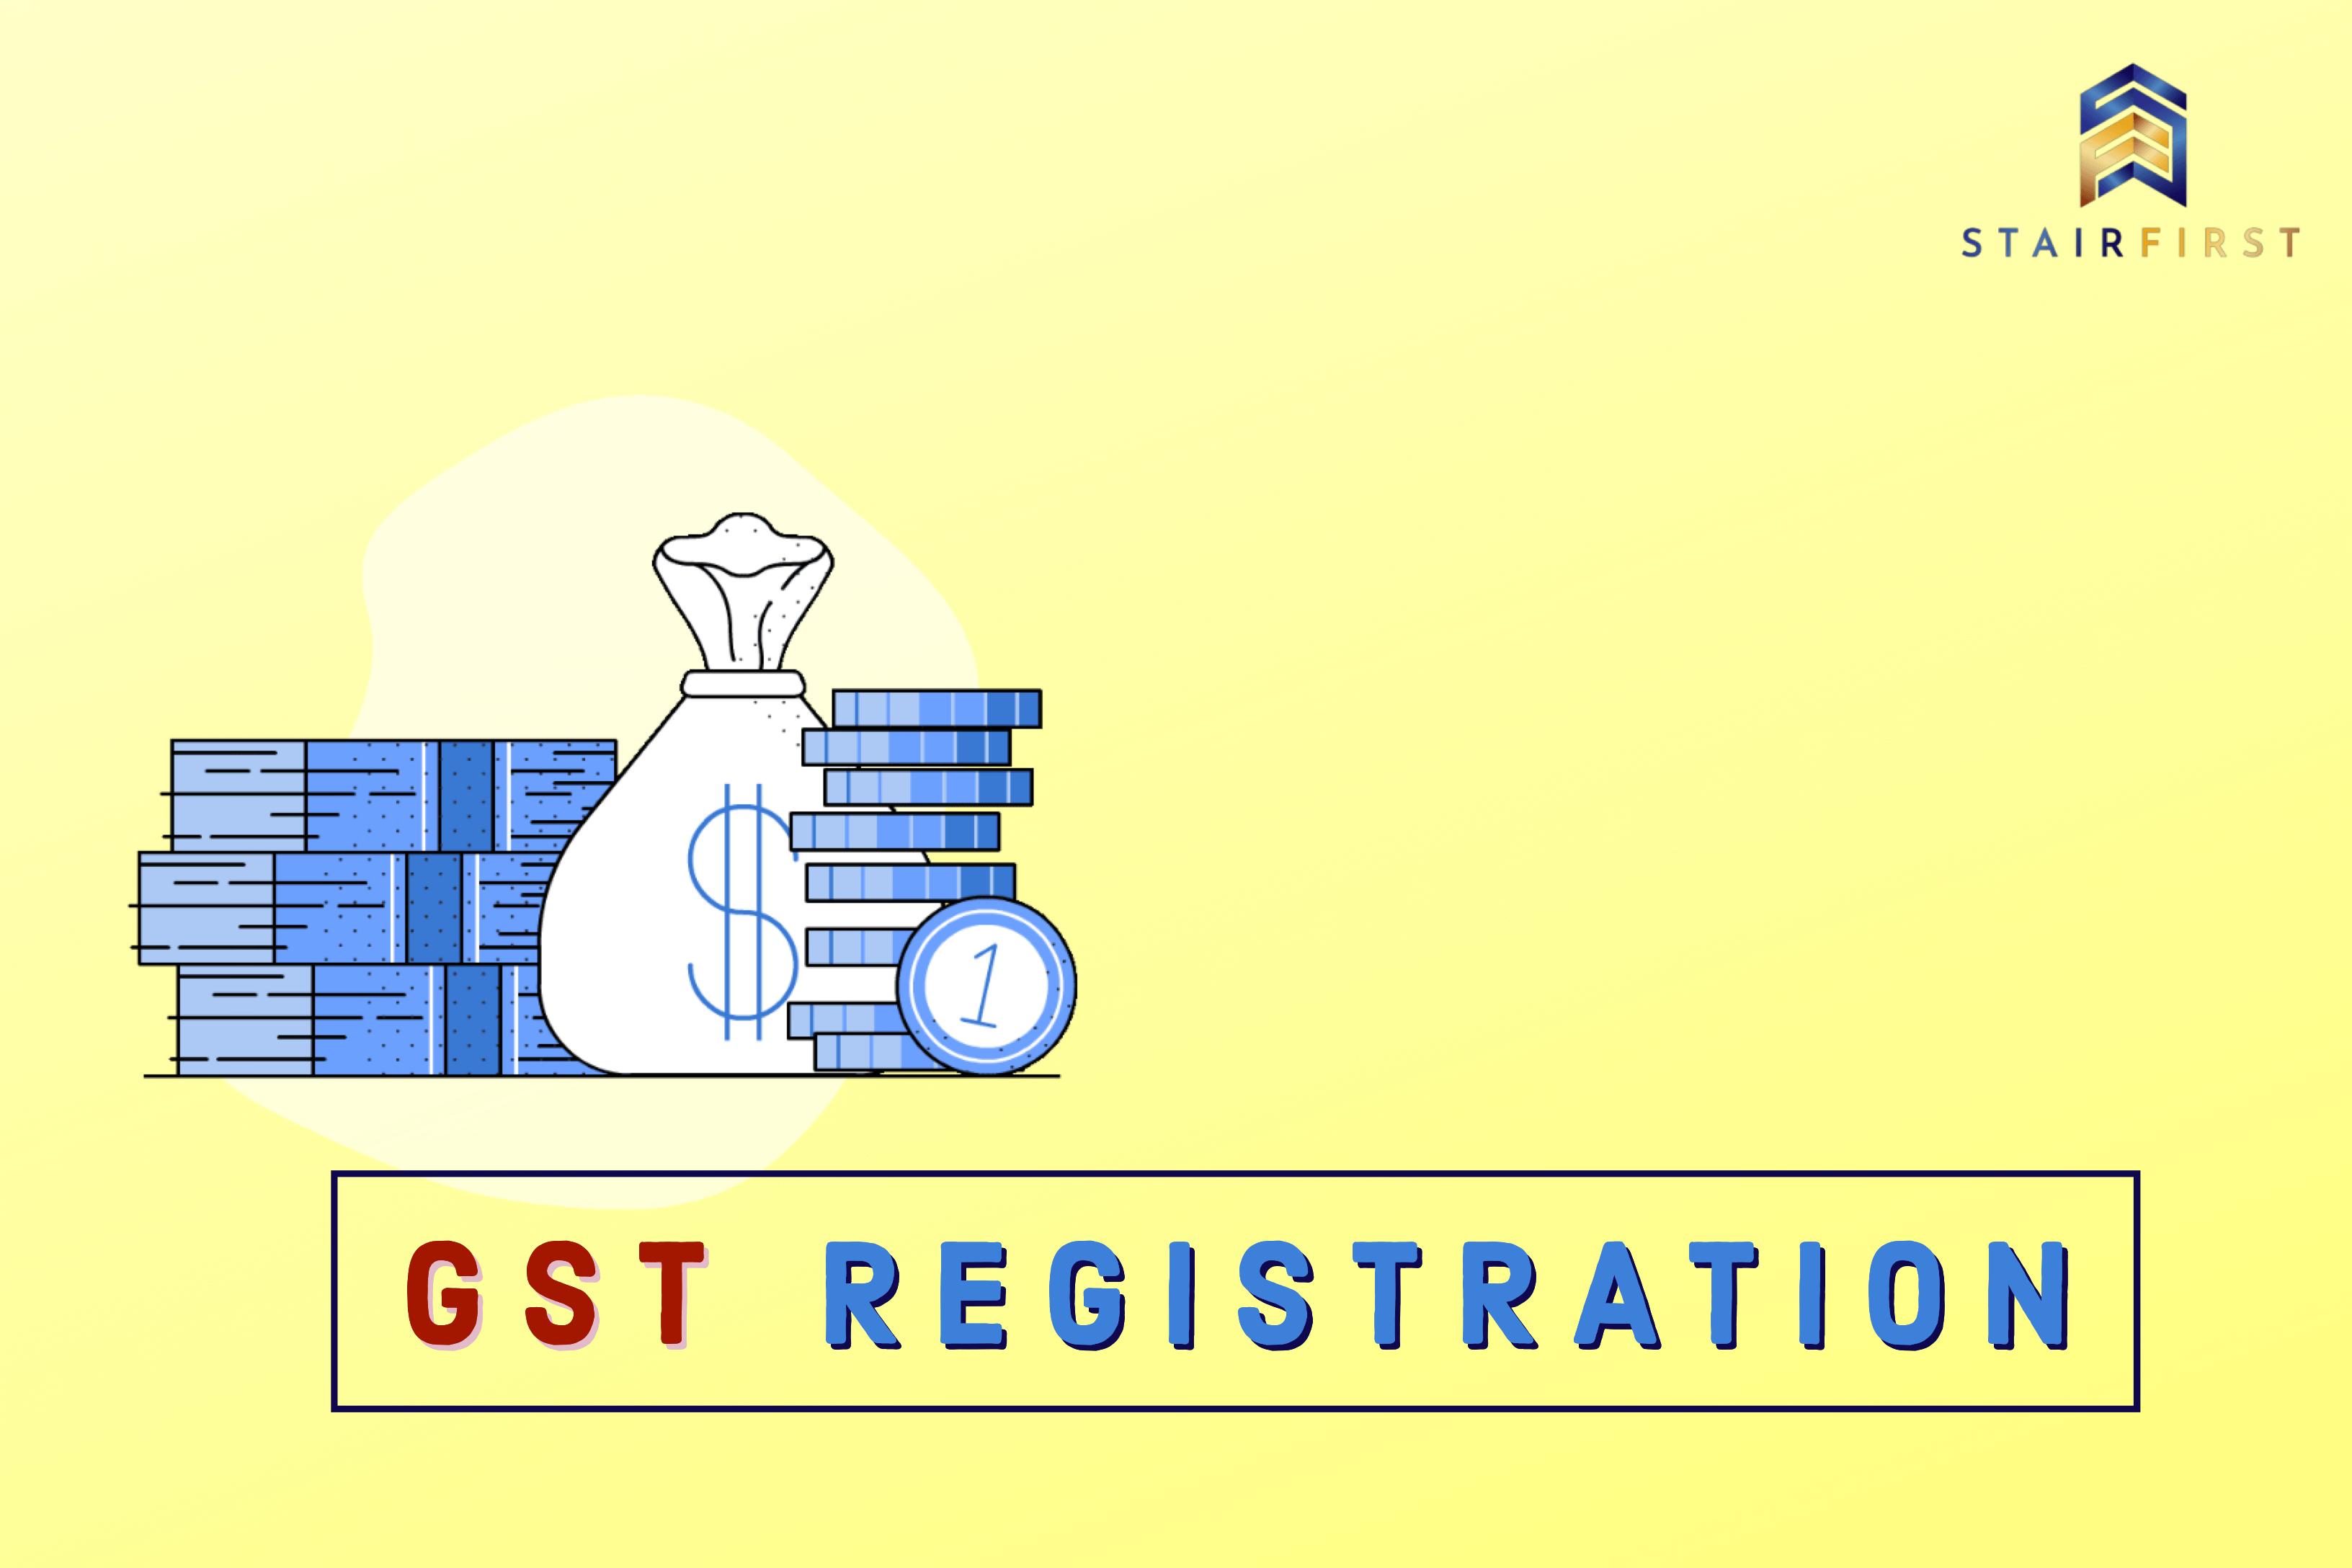 ONLINE GST REGISTRATION PROCESS